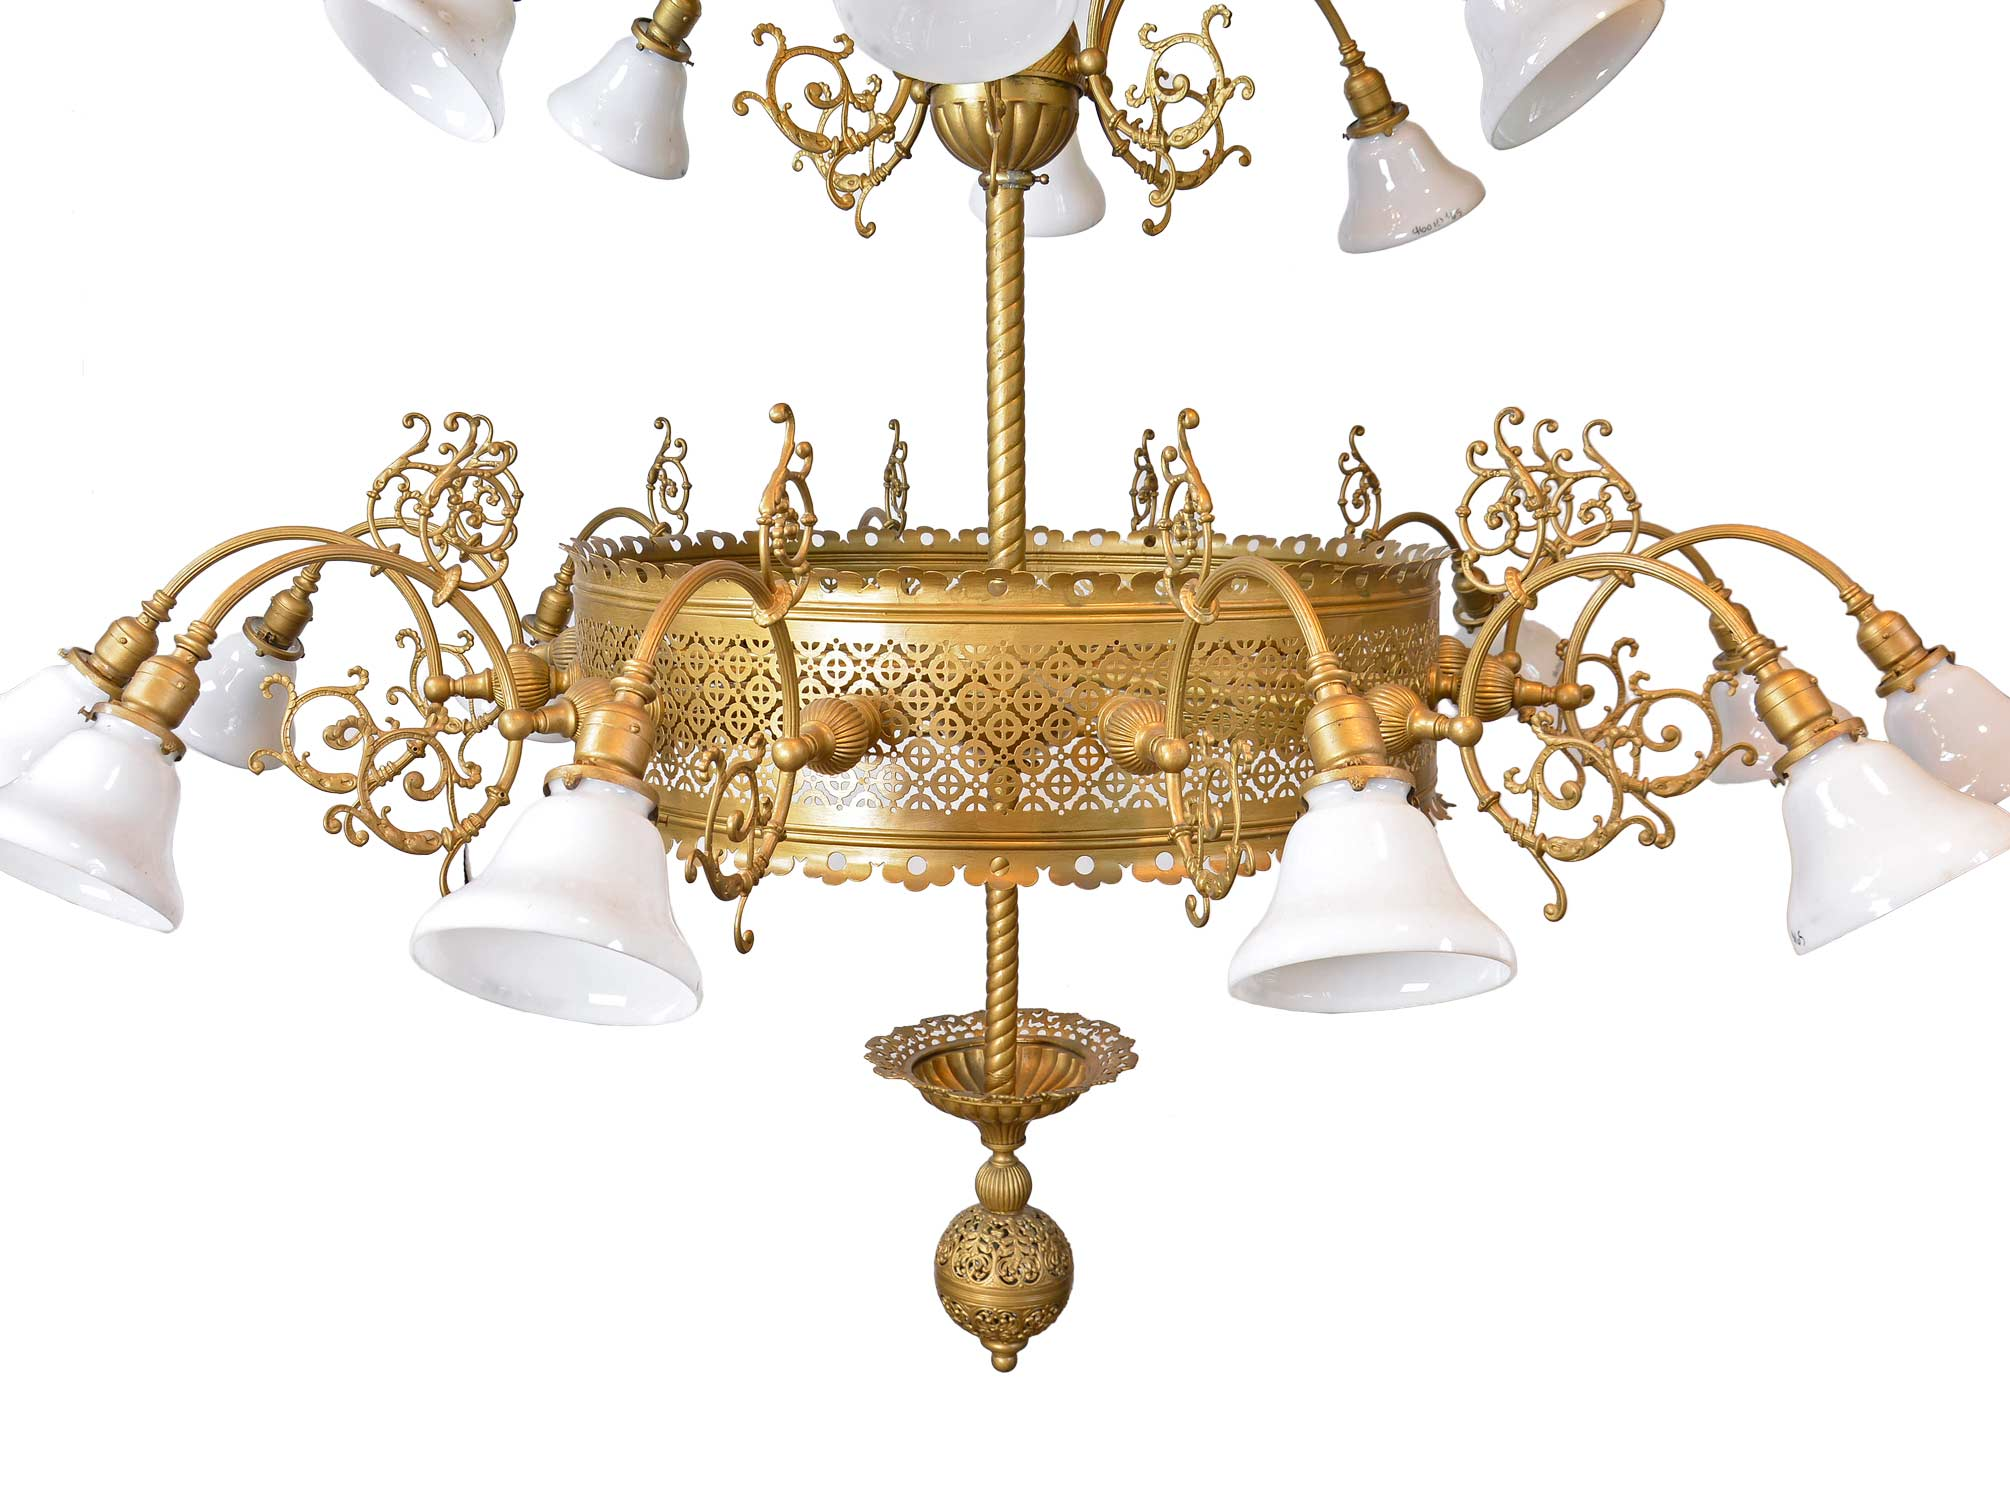 46128-oversized-20-light-3-tier-victorian-brass-chandelie-lower.jpg